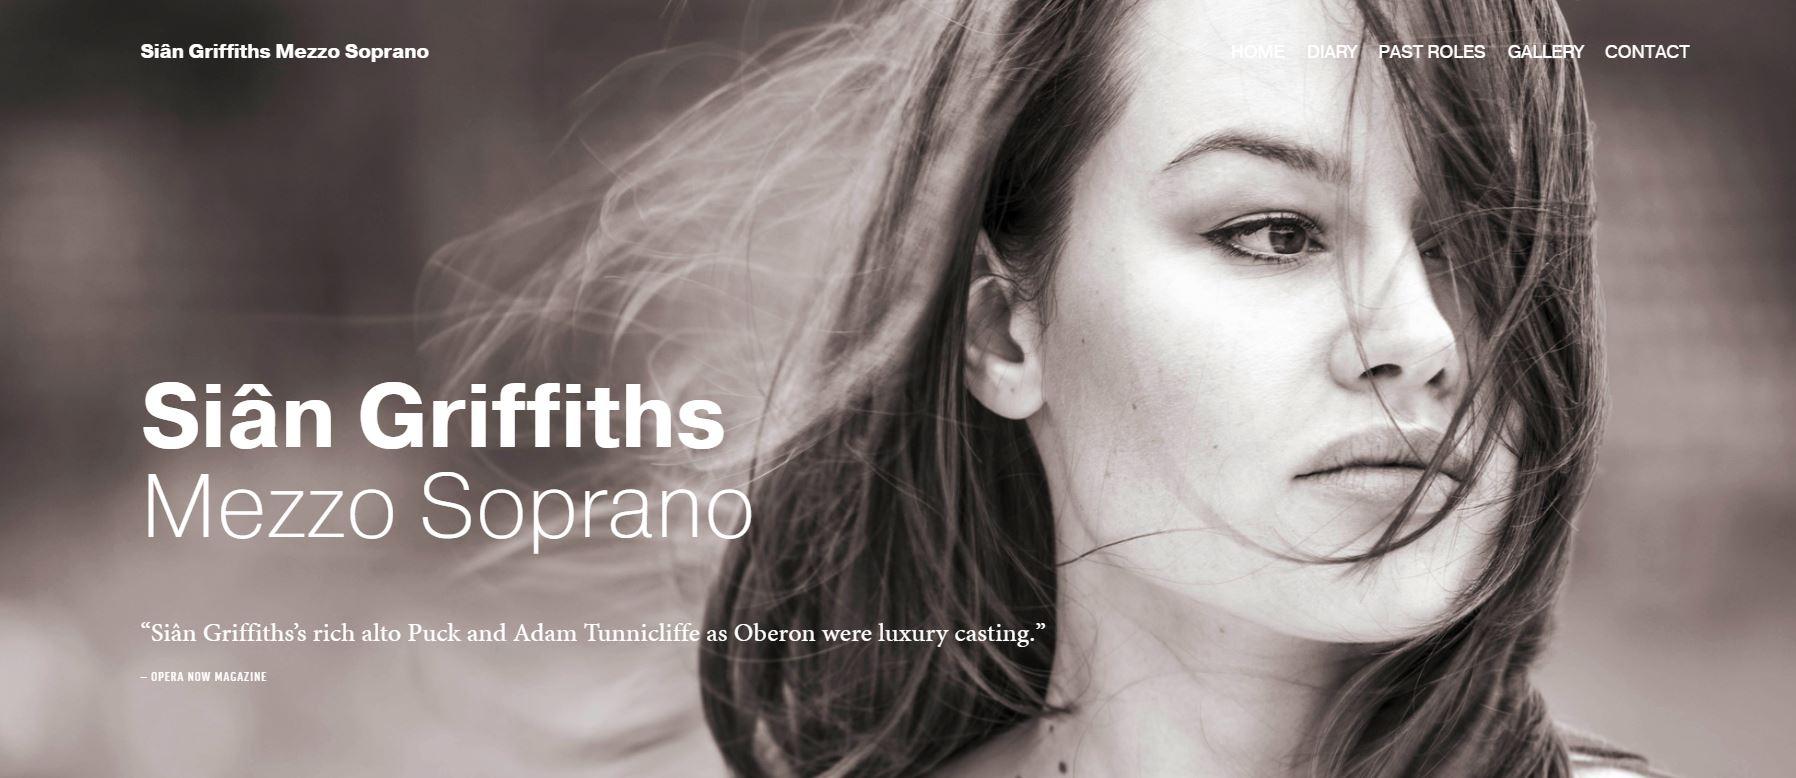 Website for mezzo soprano Sian Griffiths